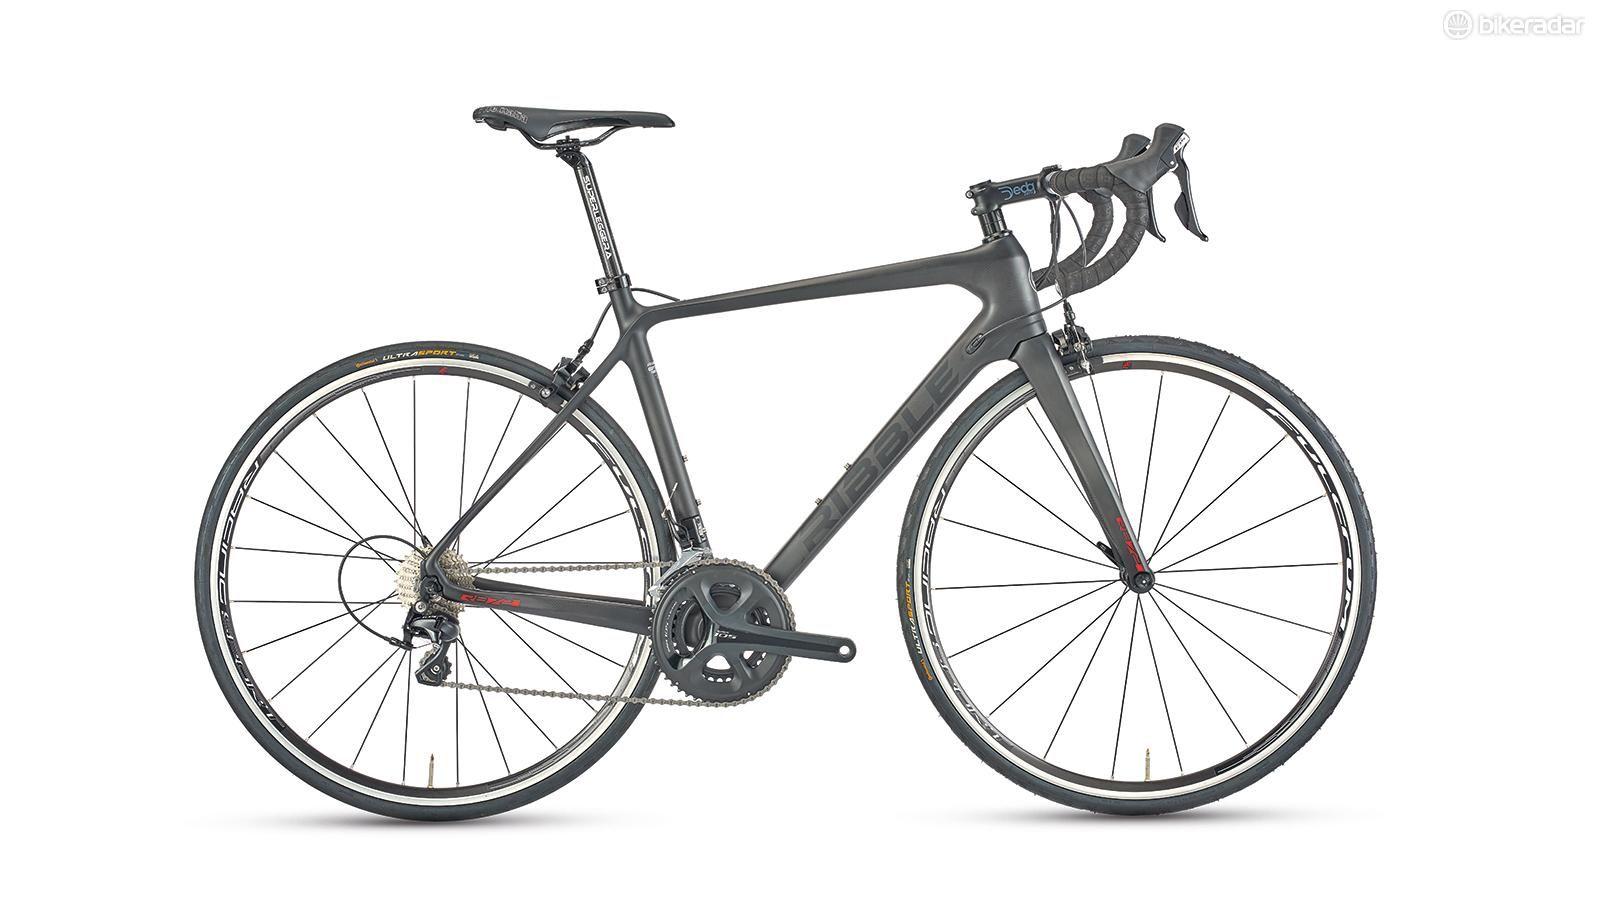 Ribble R872 105 Review Bike Bicycle